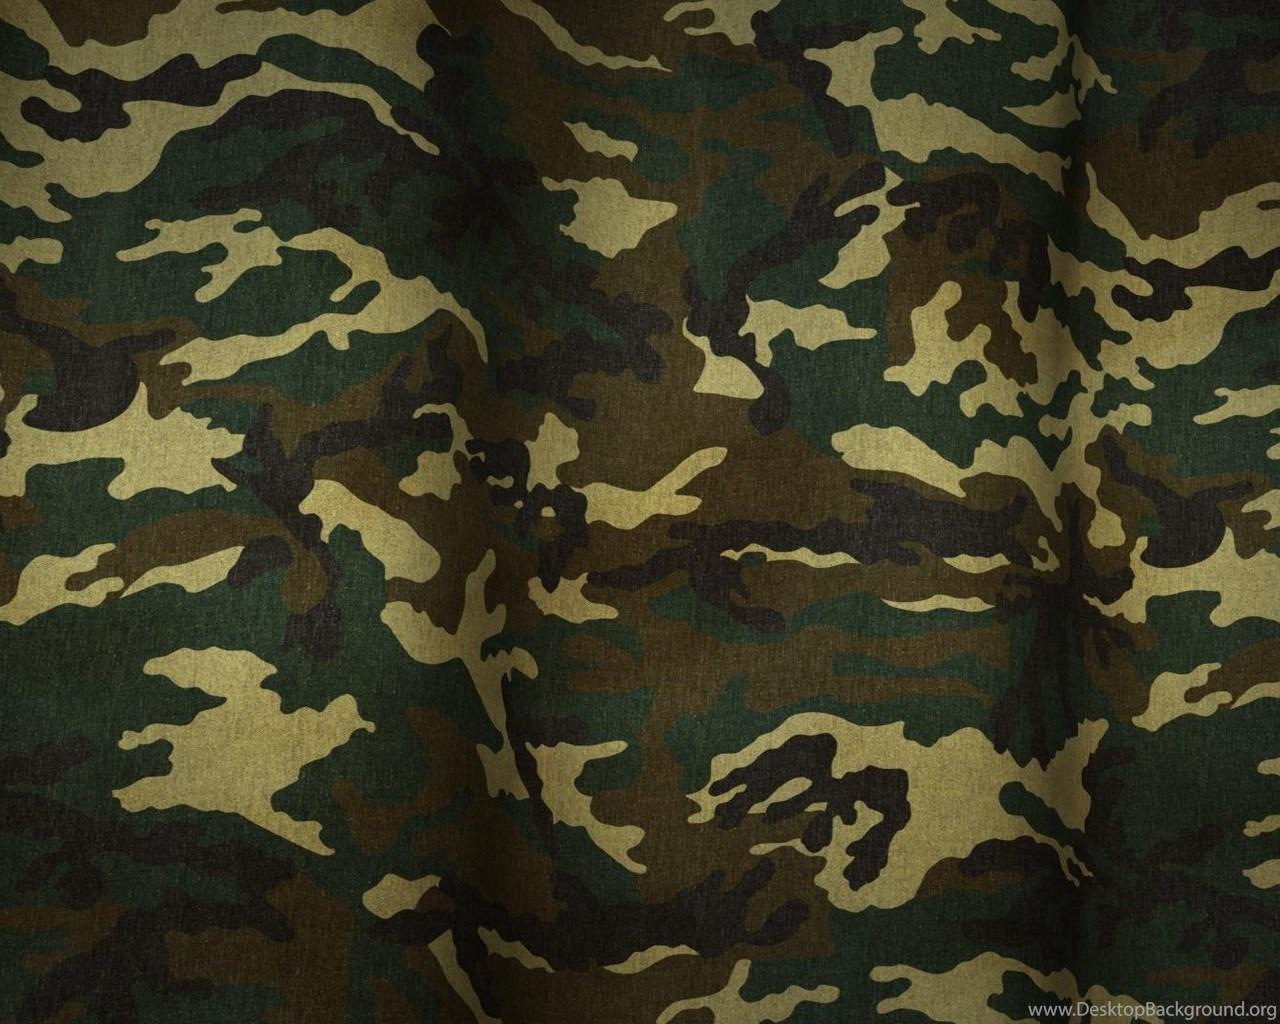 Army Camo Wallpaper: Army Camo Wallpapers Wallpapers Zone Desktop Background